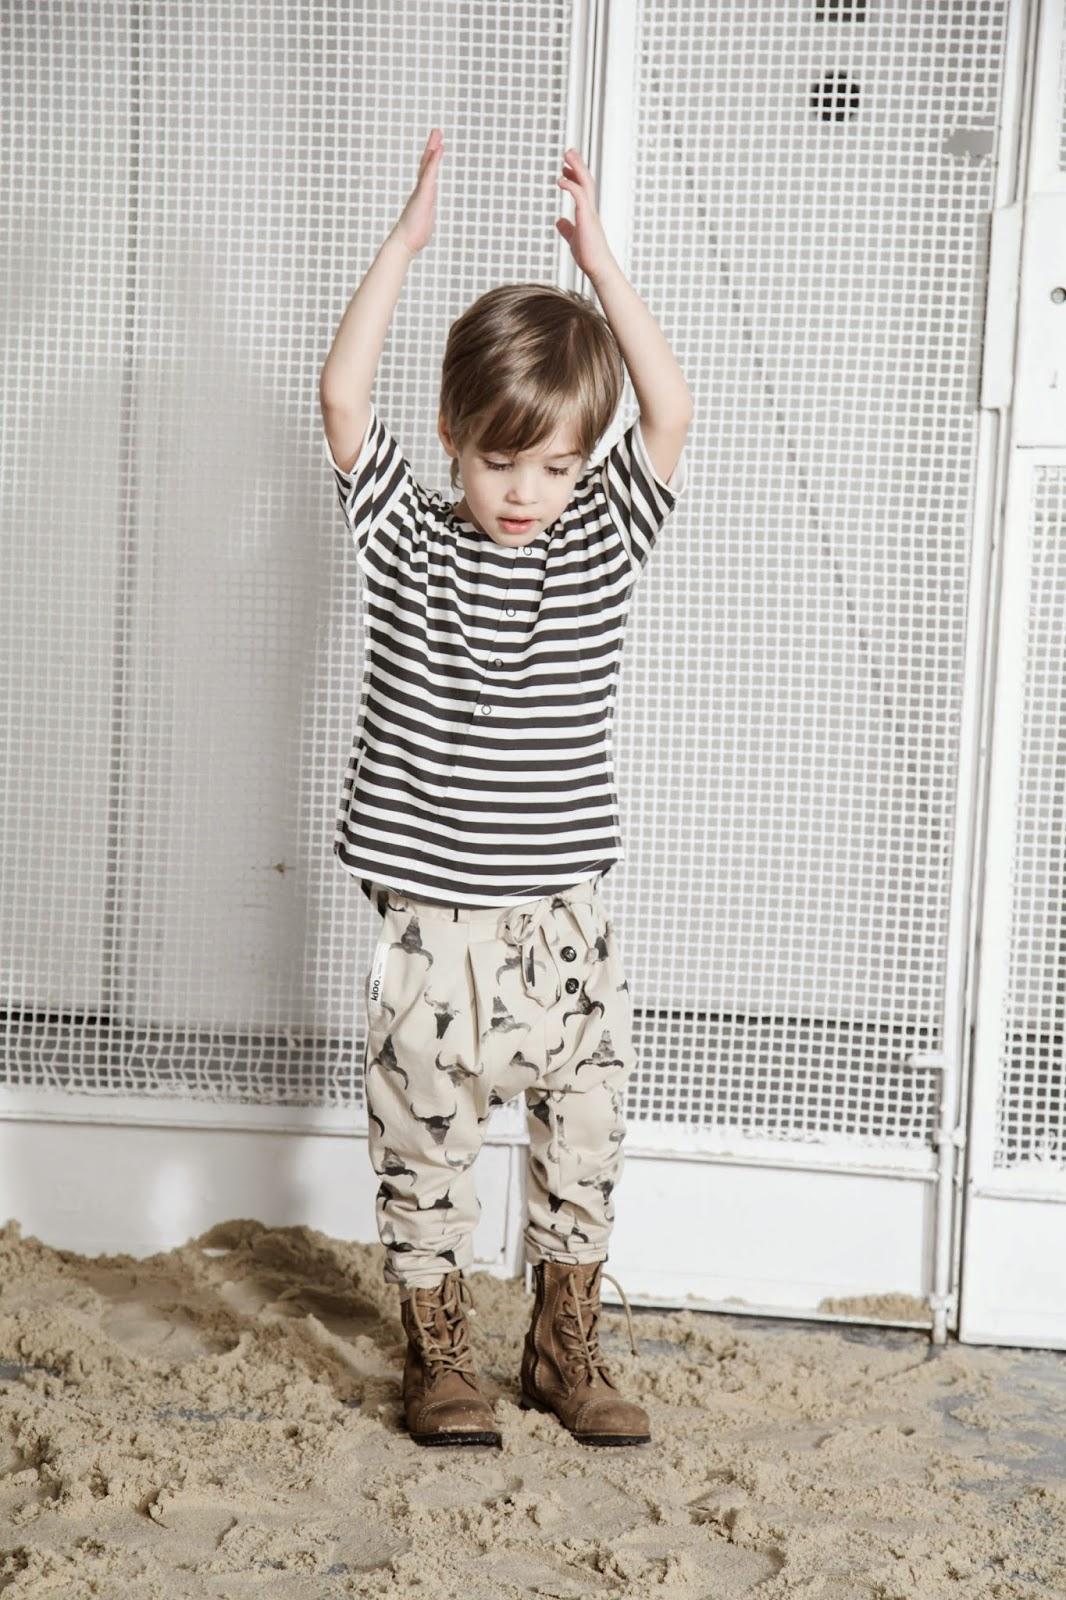 Kloo by Booso - Polish kids fashion spring-summer 2015 - baggy pants